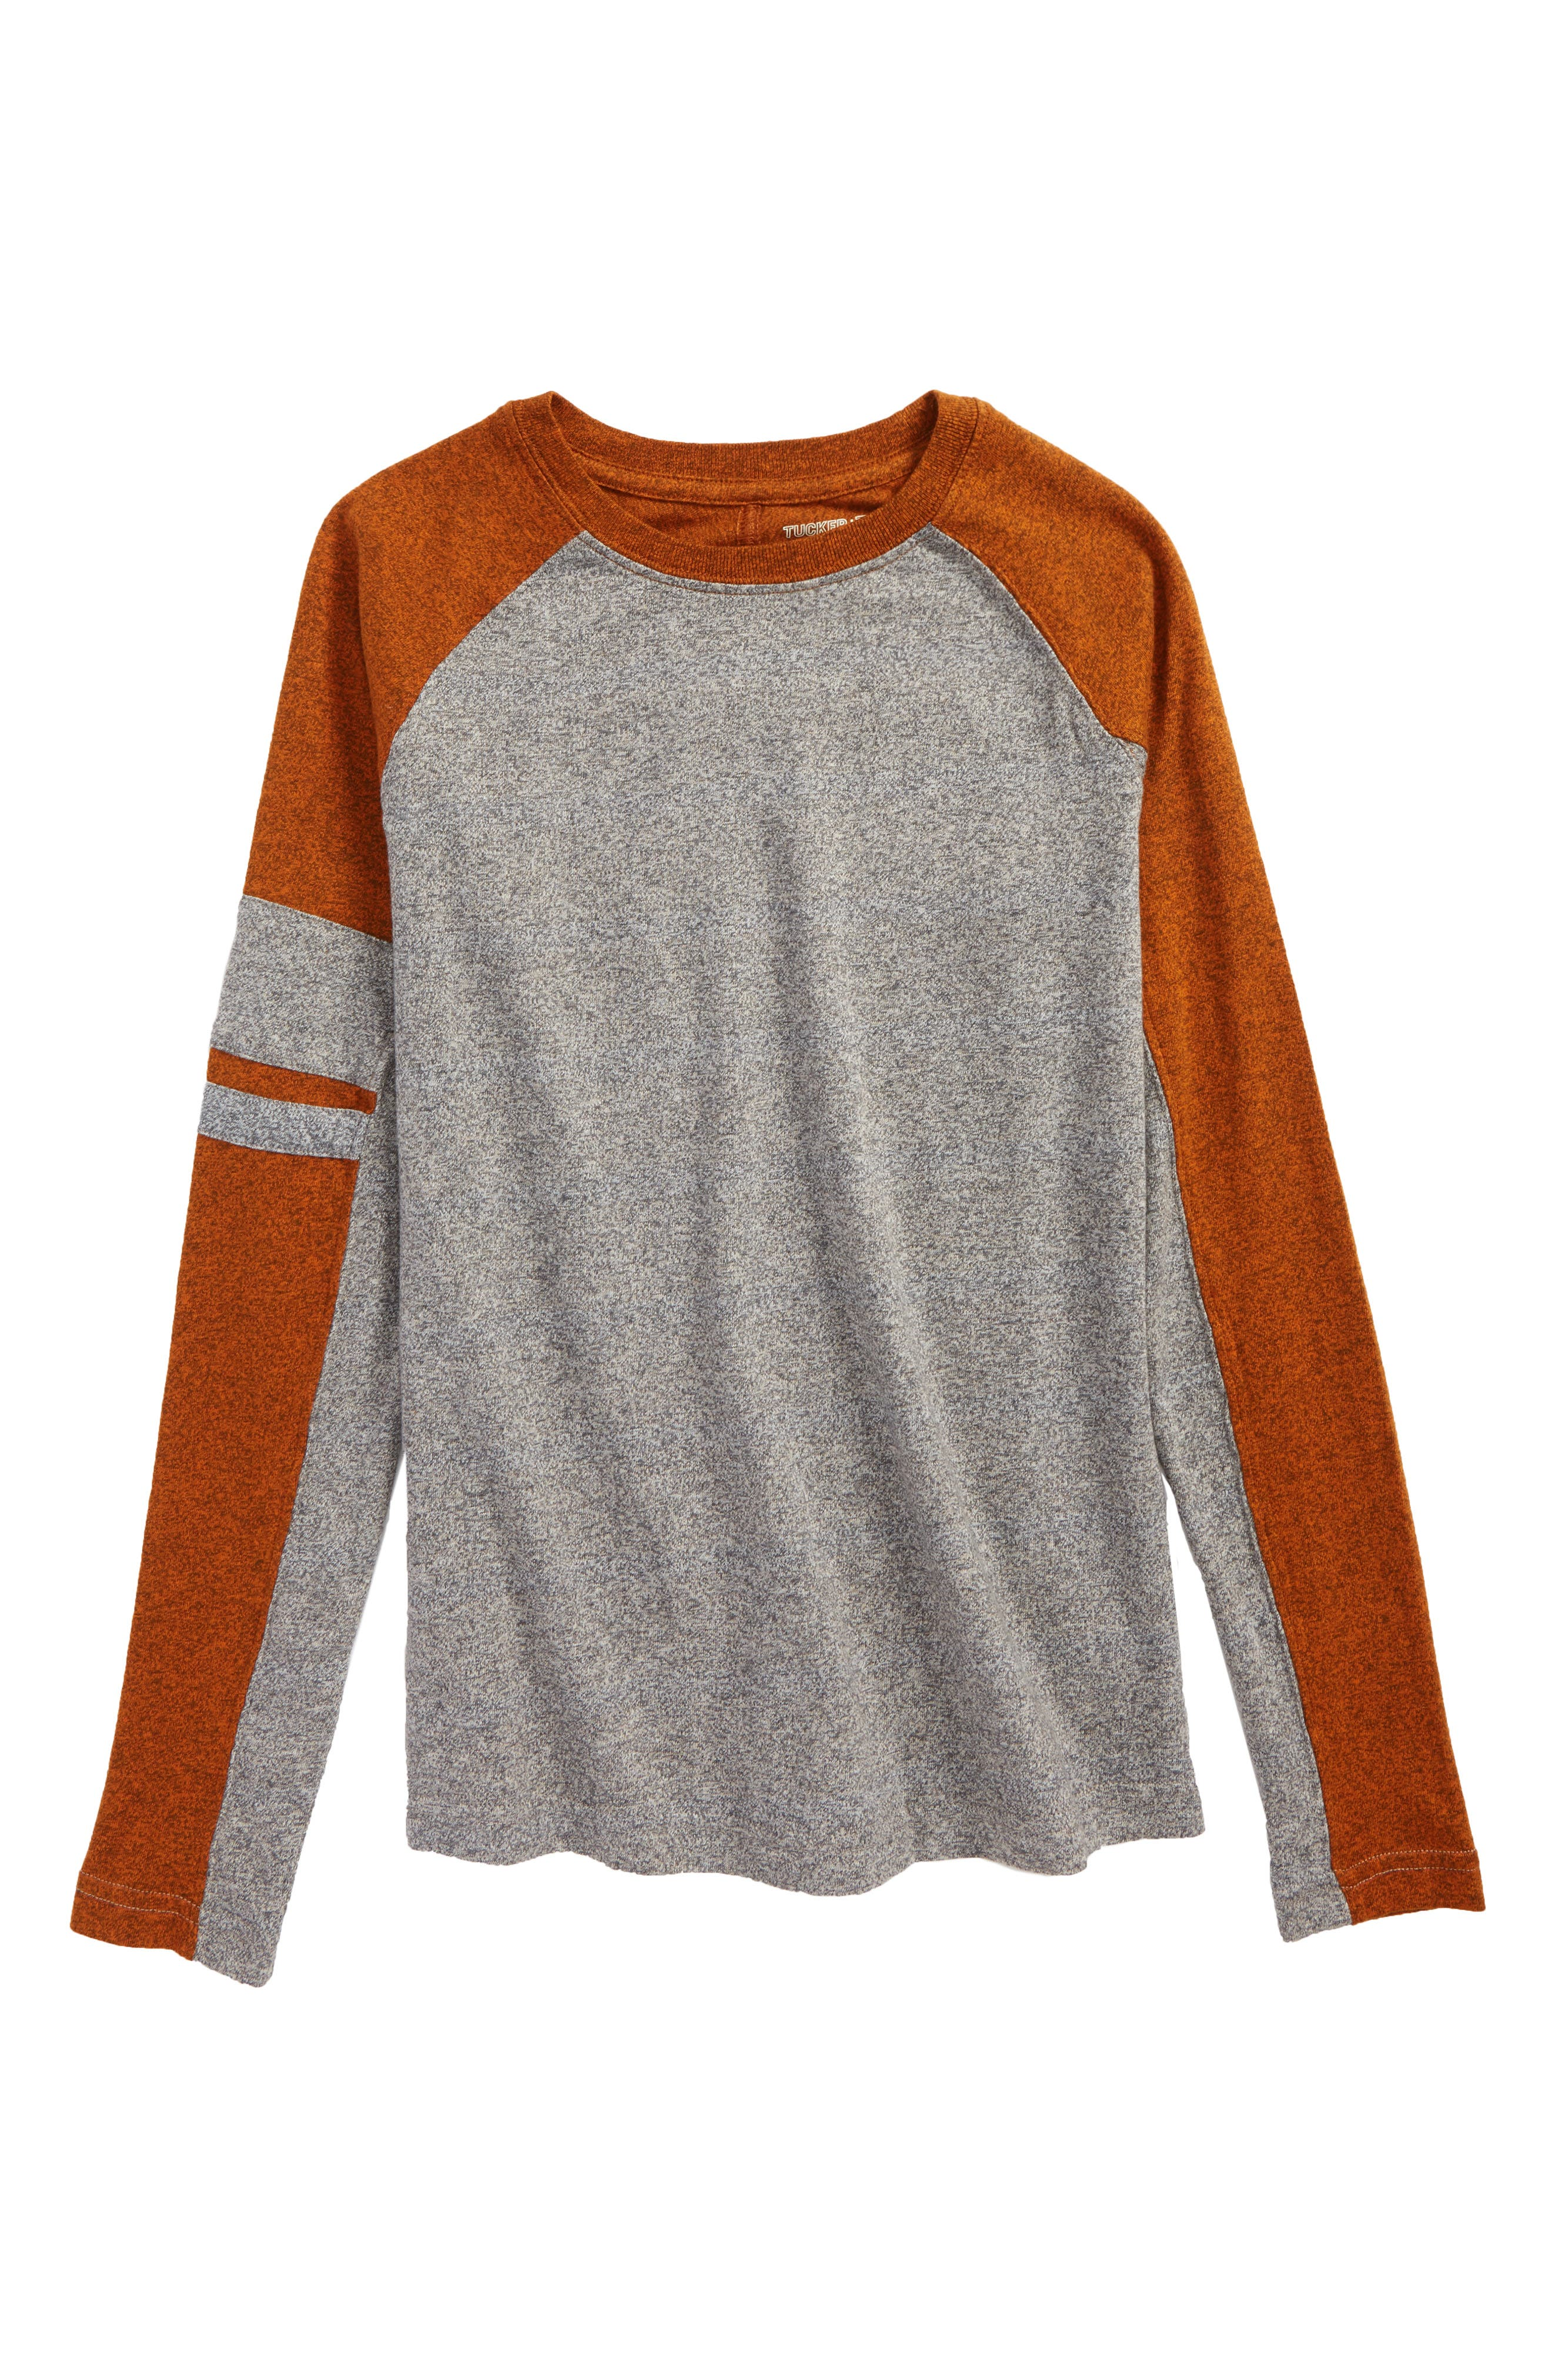 Main Image - Tucker + Tate Varsity Raglan Shirt (Big Boys)